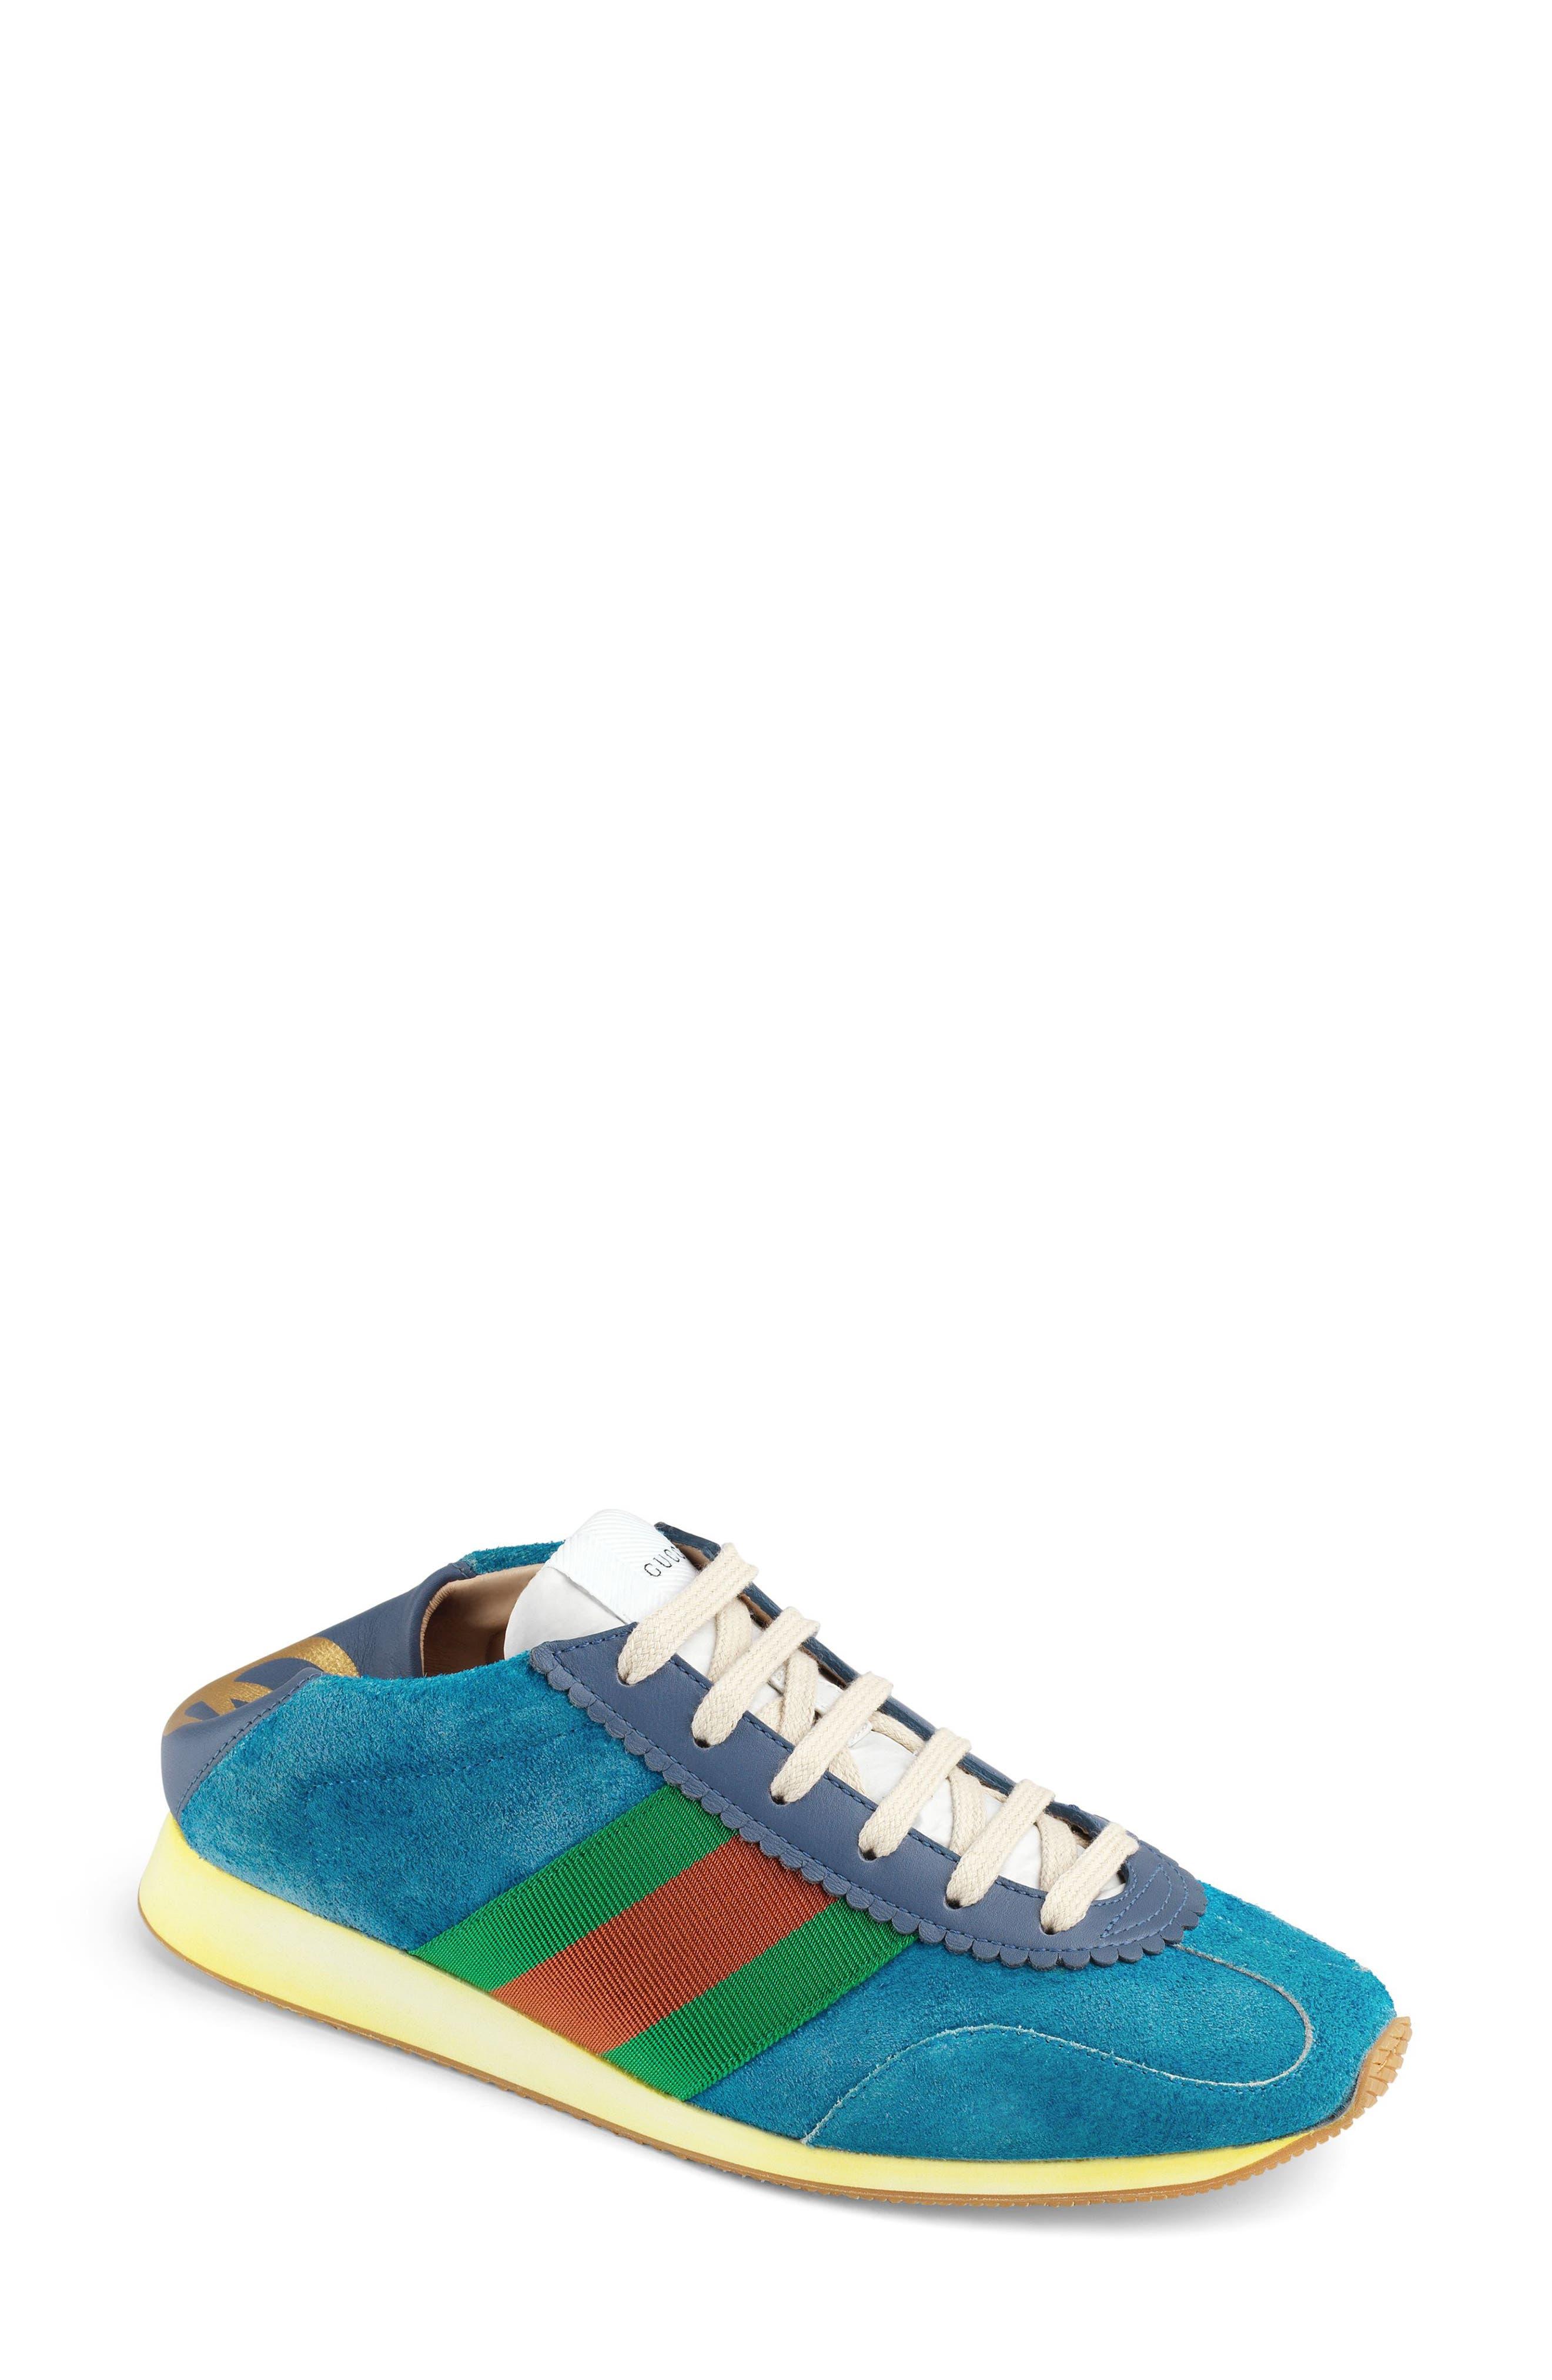 Rocket Convertible Sneaker,                         Main,                         color, BLUE